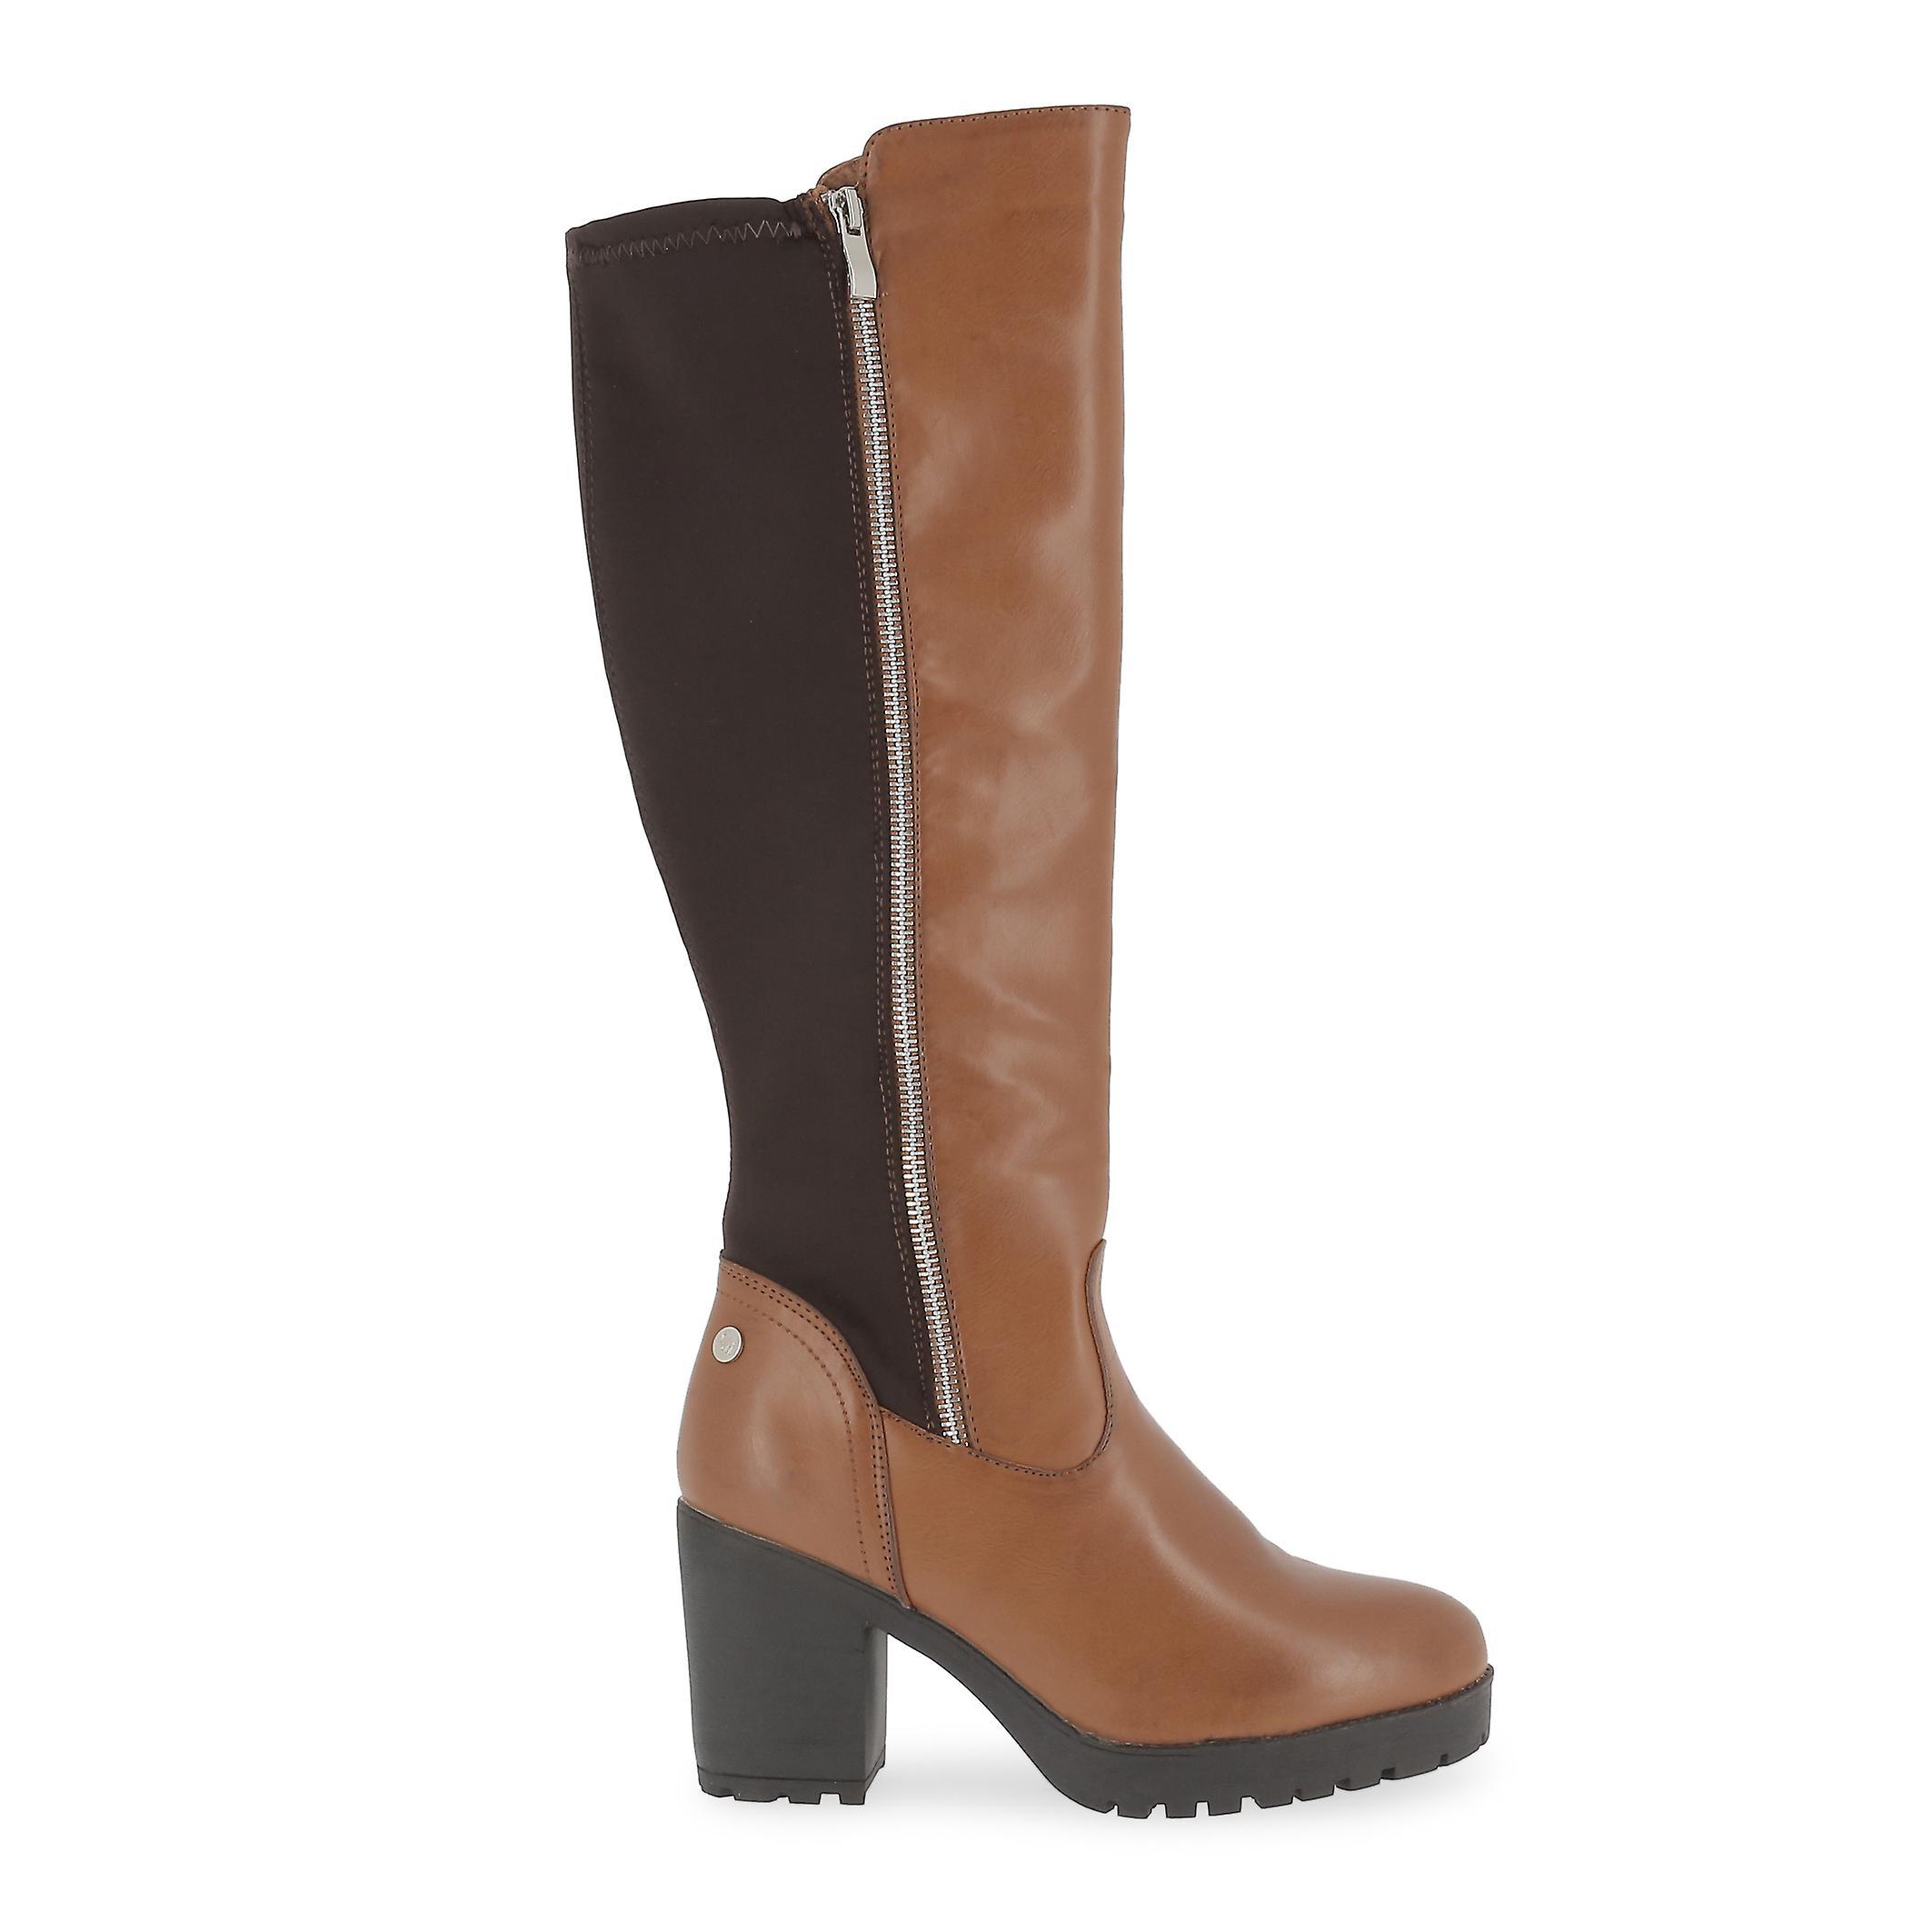 Xti Original Women Fall/Winter Boot Brown Color - 57815 9m6EA